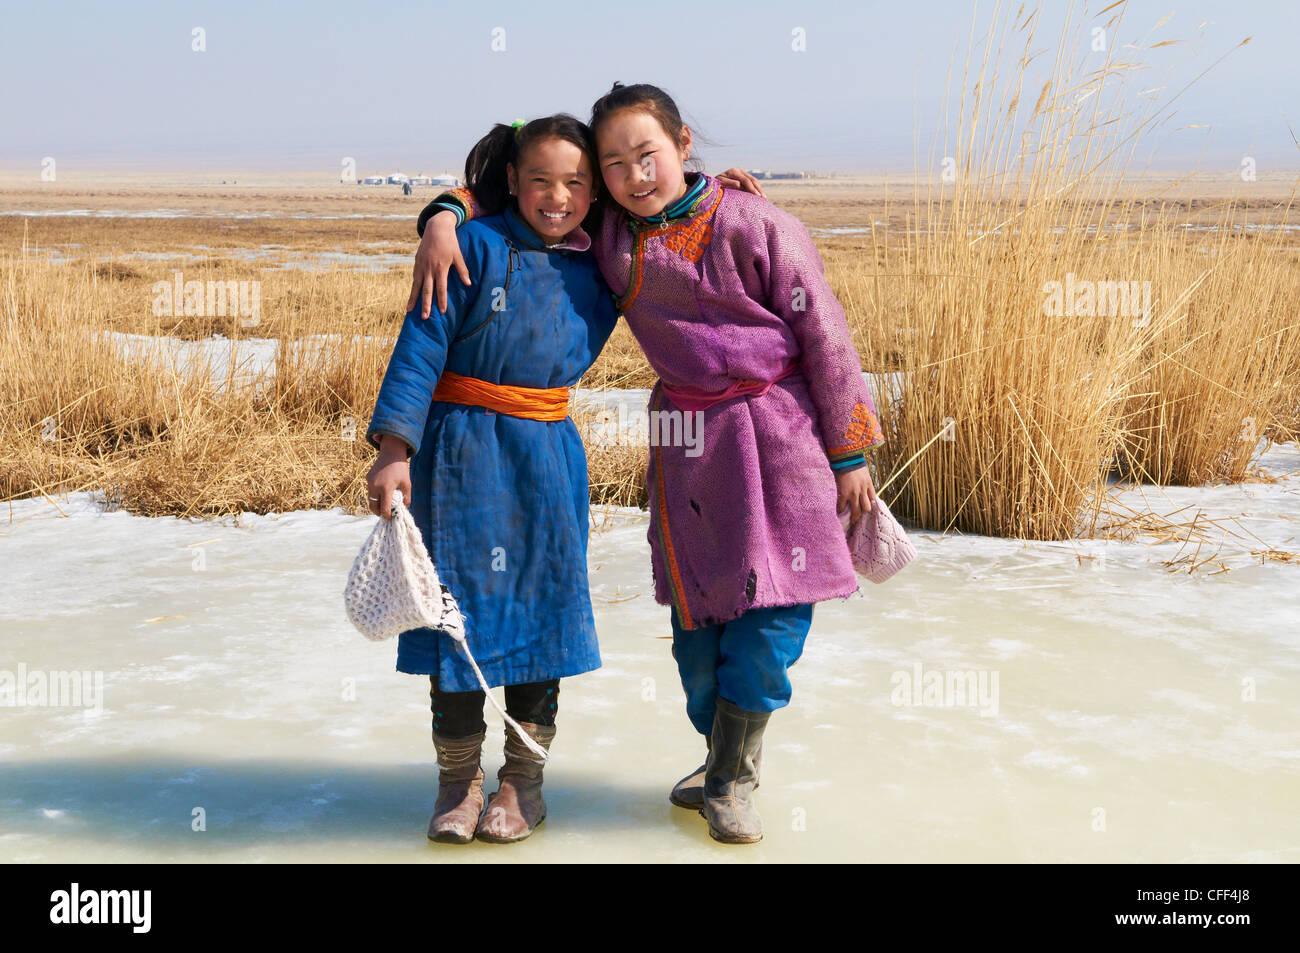 Jóvenes muchachas mongol en traje tradicional (deel), provincia de Khovd, Mongolia, Asia Central, África Imagen De Stock